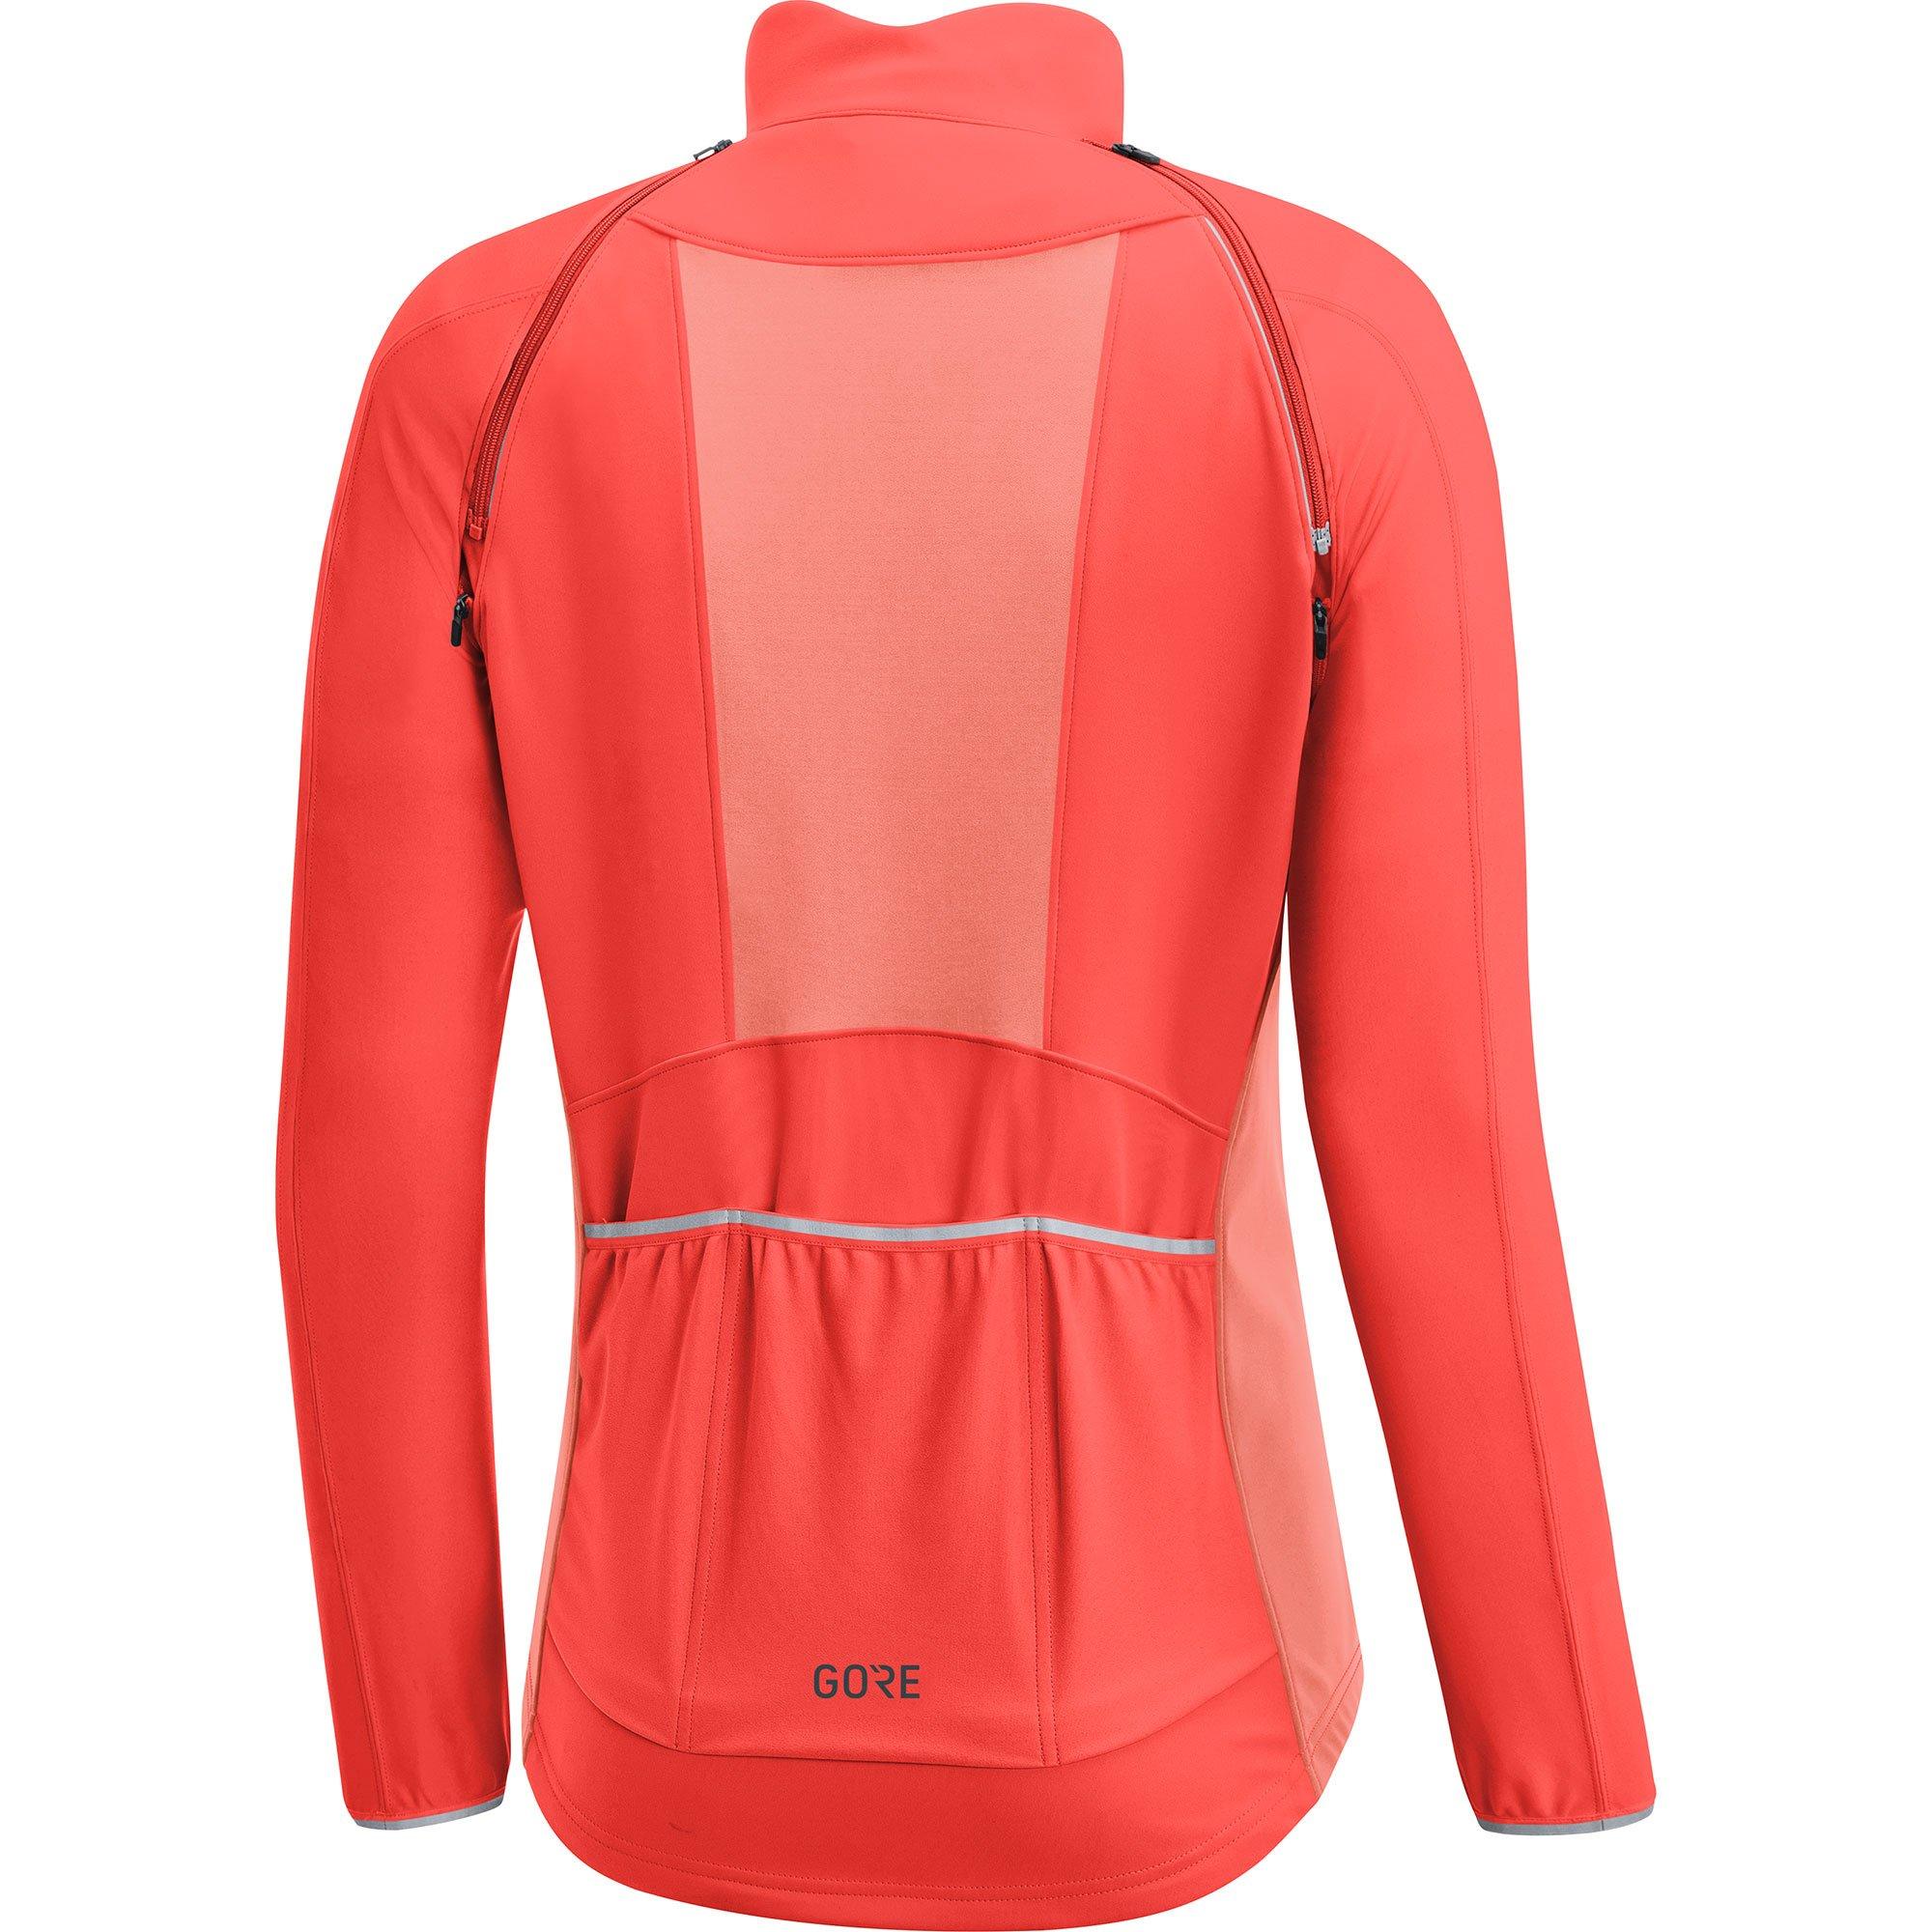 GORE Wear Women's Windproof Cycling Jacket, Removable Sleeves, GORE Wear C3 Women's GORE Wear WINDSTOPPER Phantom Zip-Off Jacket, Size: L, Color: Lumi Orange/Coral Glow, 100191 by GORE WEAR (Image #3)